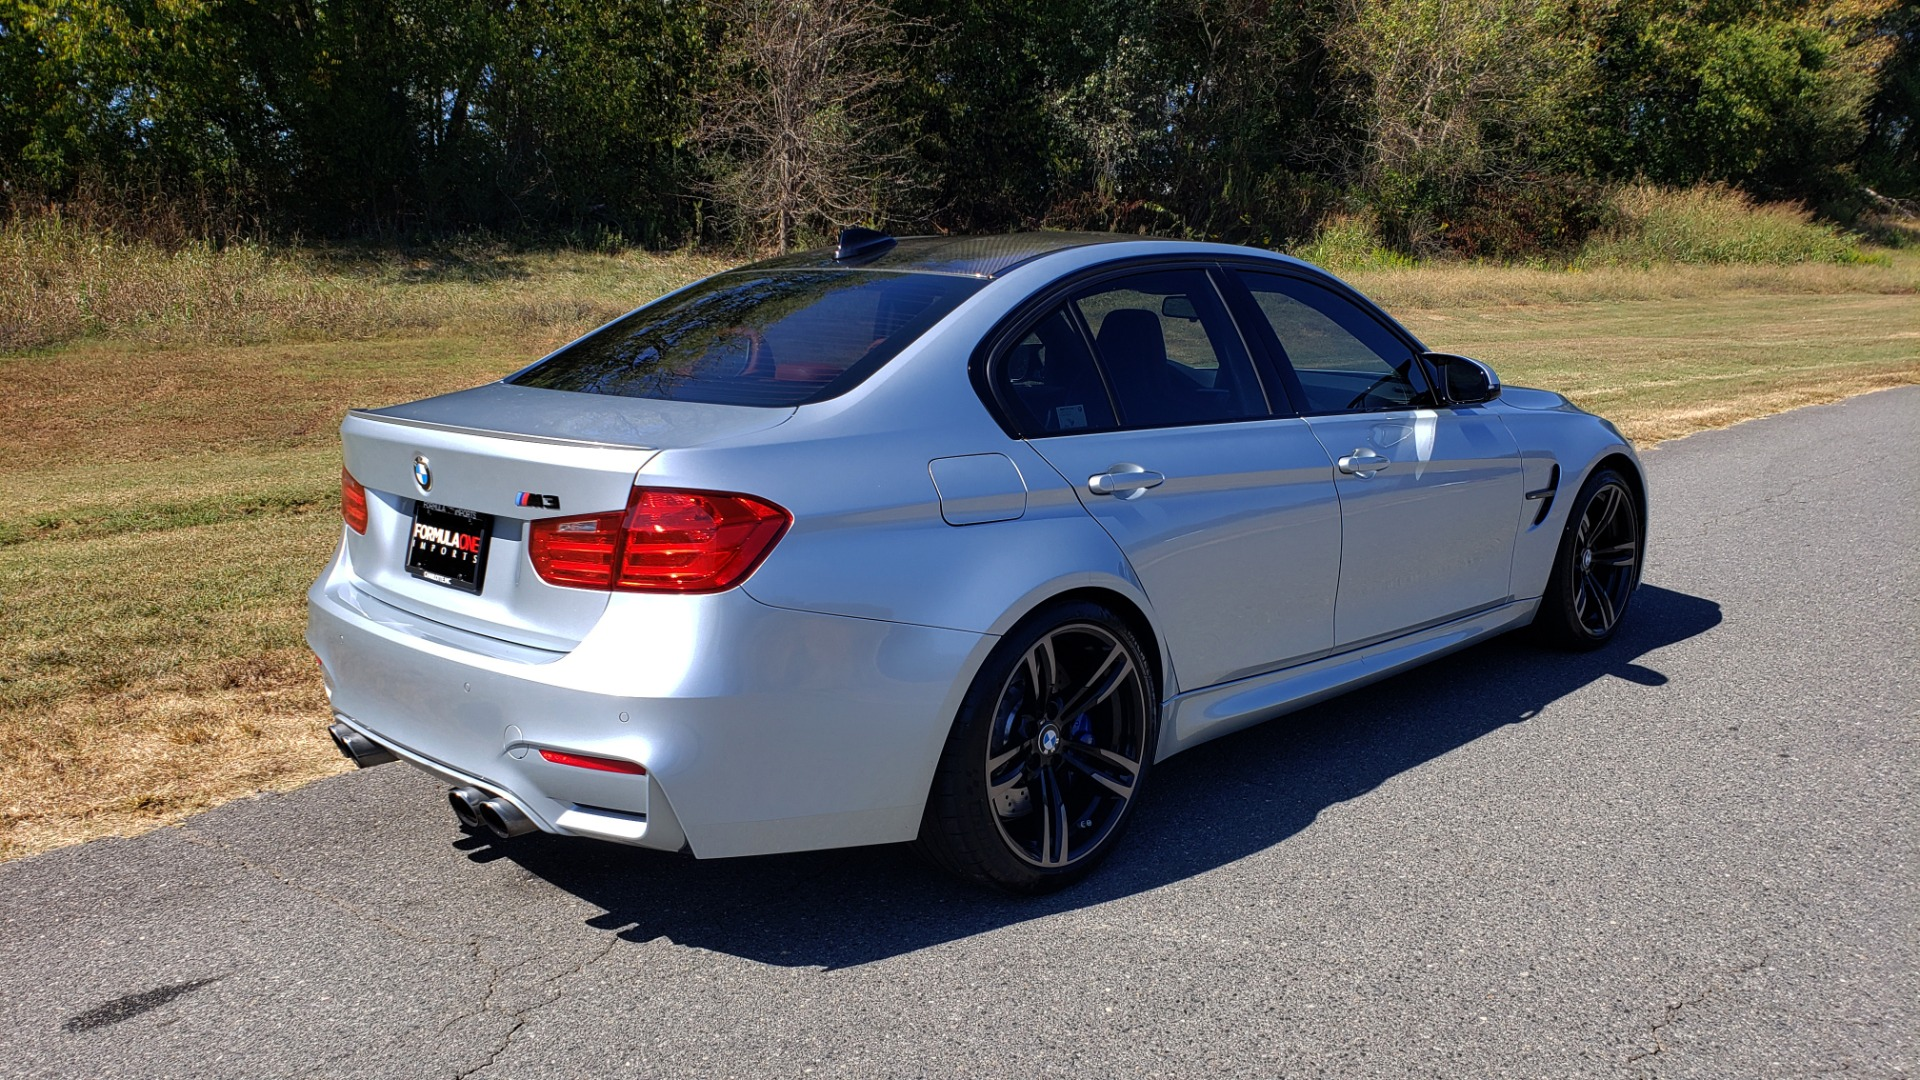 Used 2015 BMW M3 EXECUTIVE PKG / NAV / CAMERA / HUD / CARBON FIBER ROOF for sale Sold at Formula Imports in Charlotte NC 28227 12